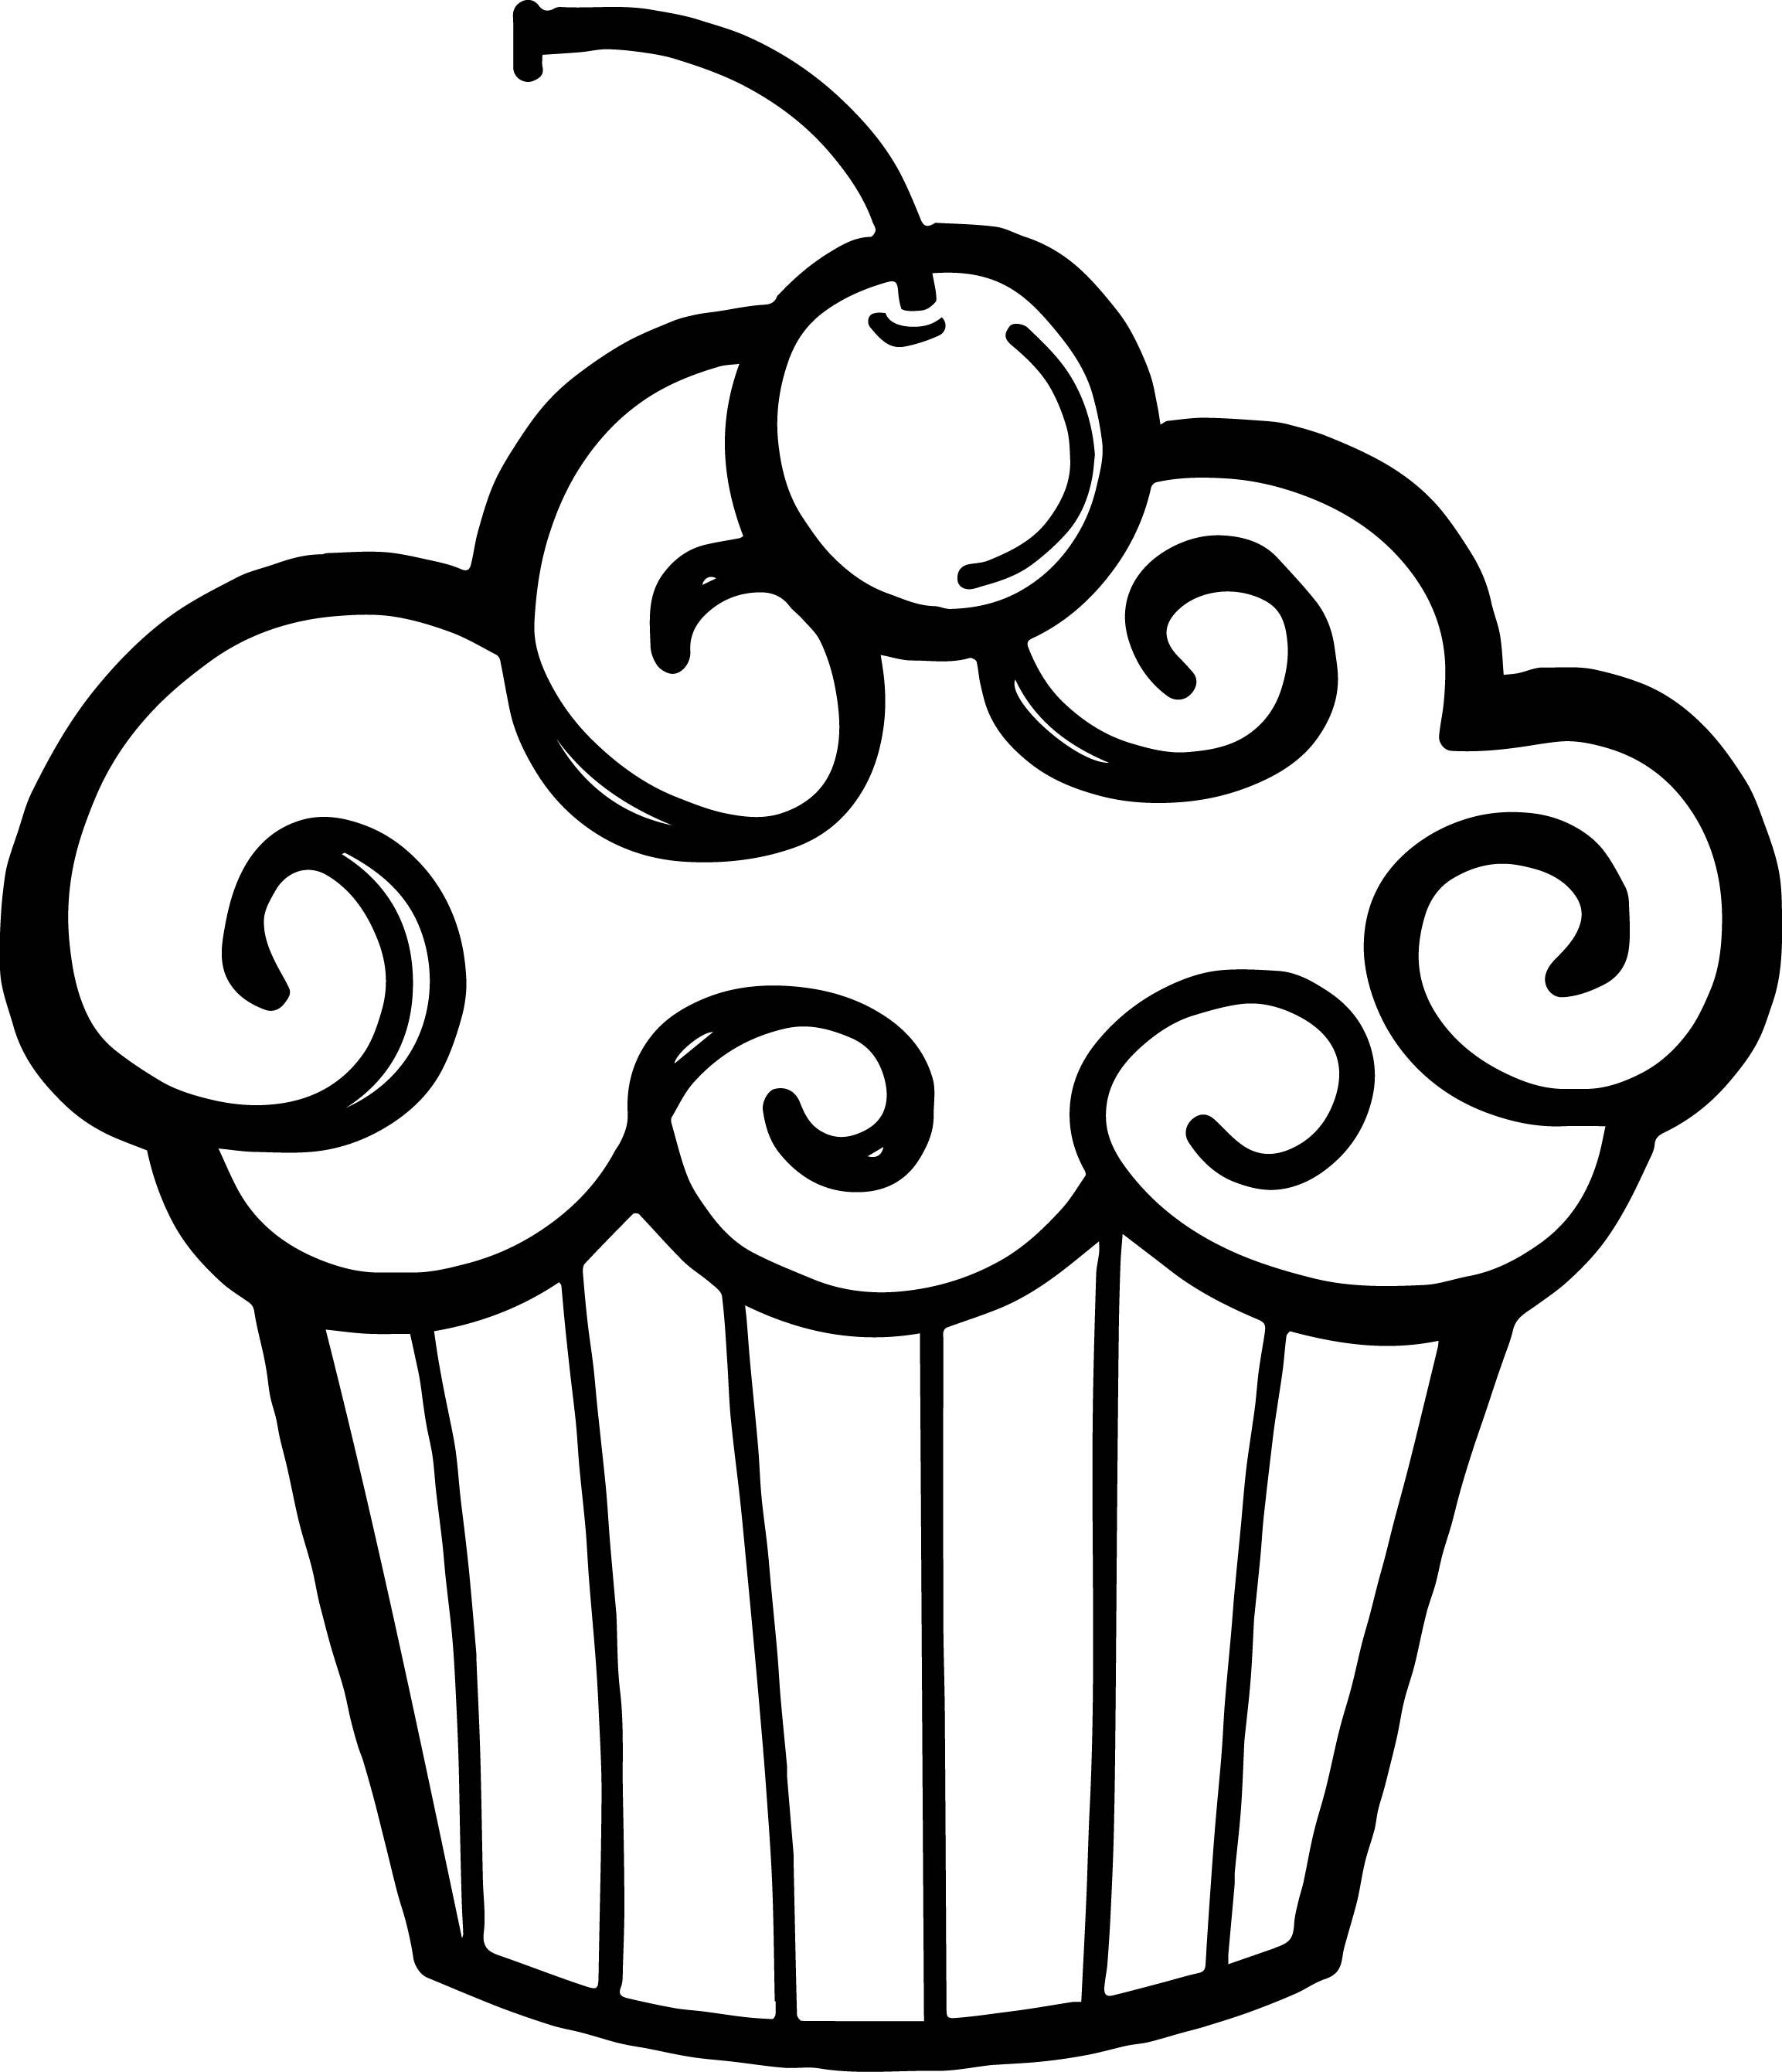 Cake black and white slice of cake clipart - WikiClipArt  |Cake Slice Clipart Black And White